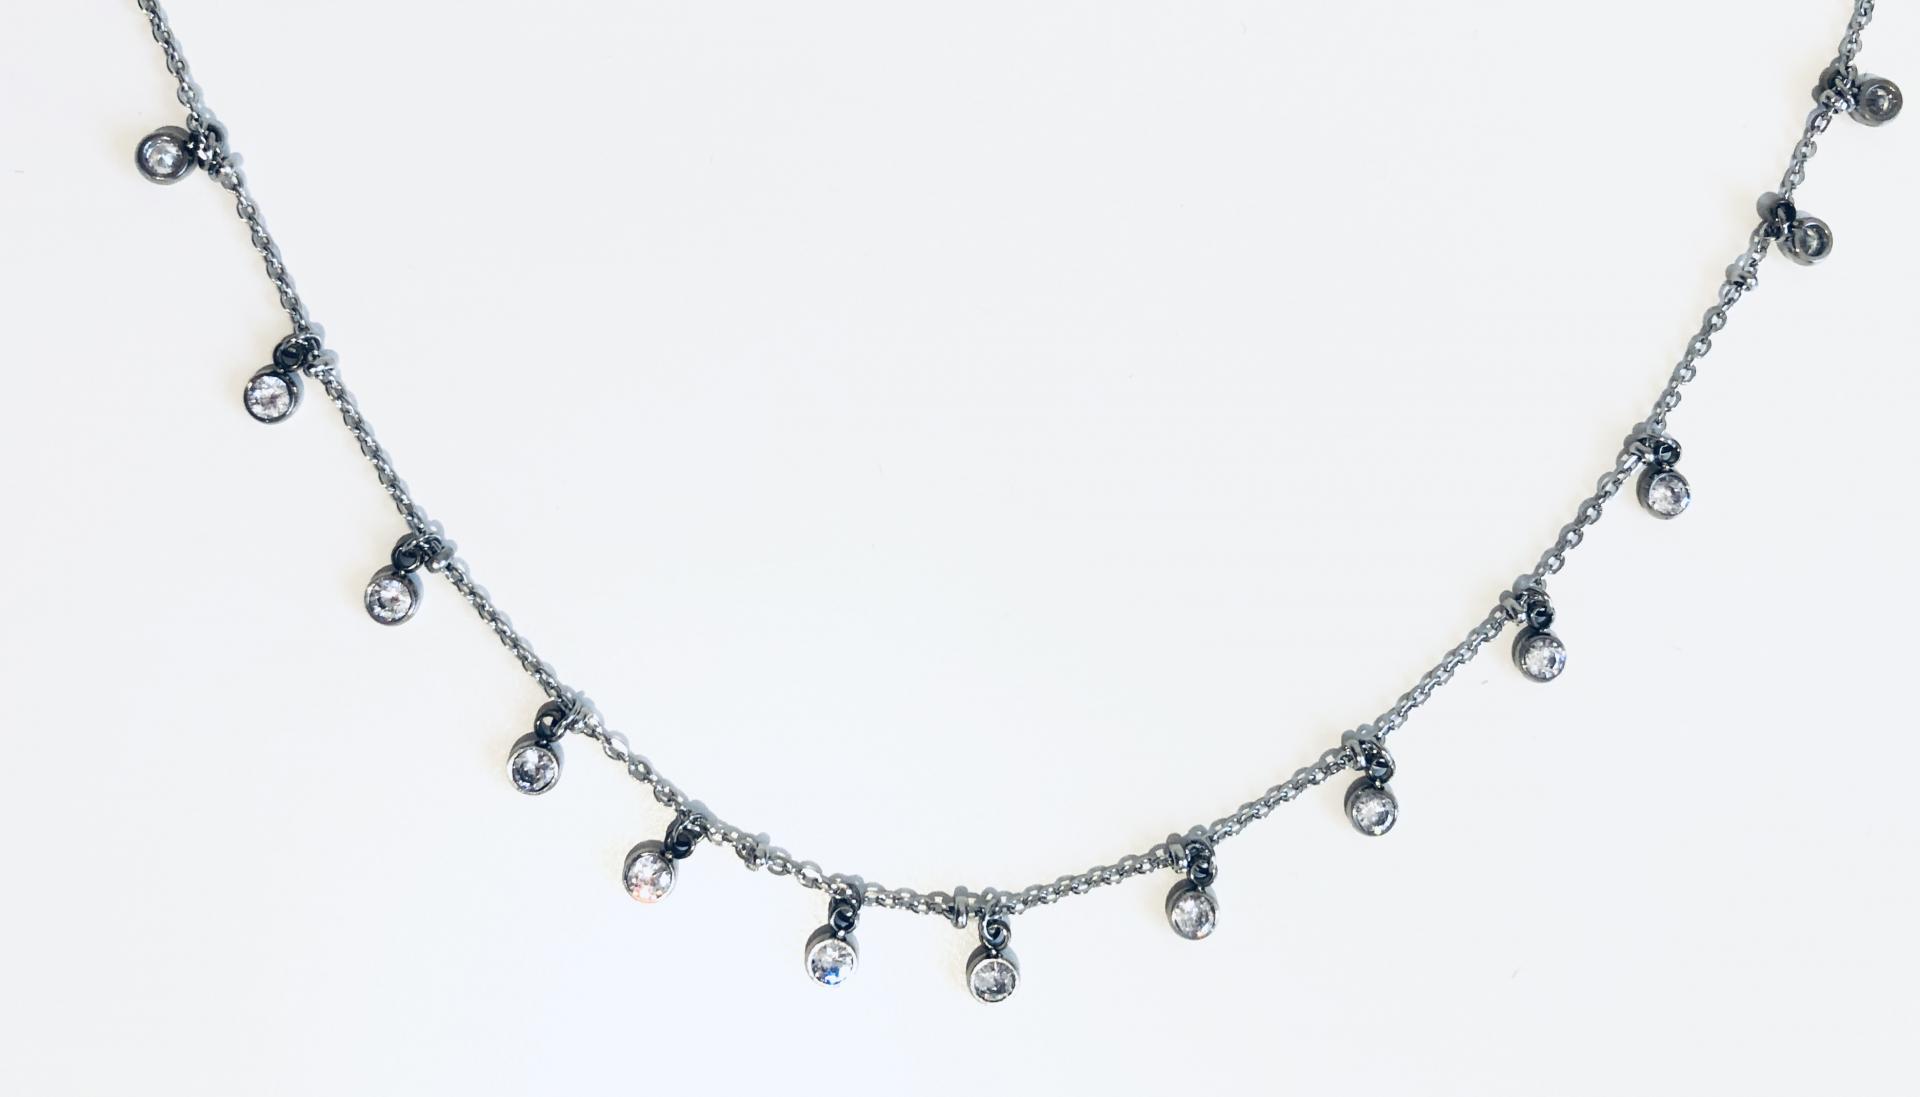 collar gargantilla de acero con cristales engarzados